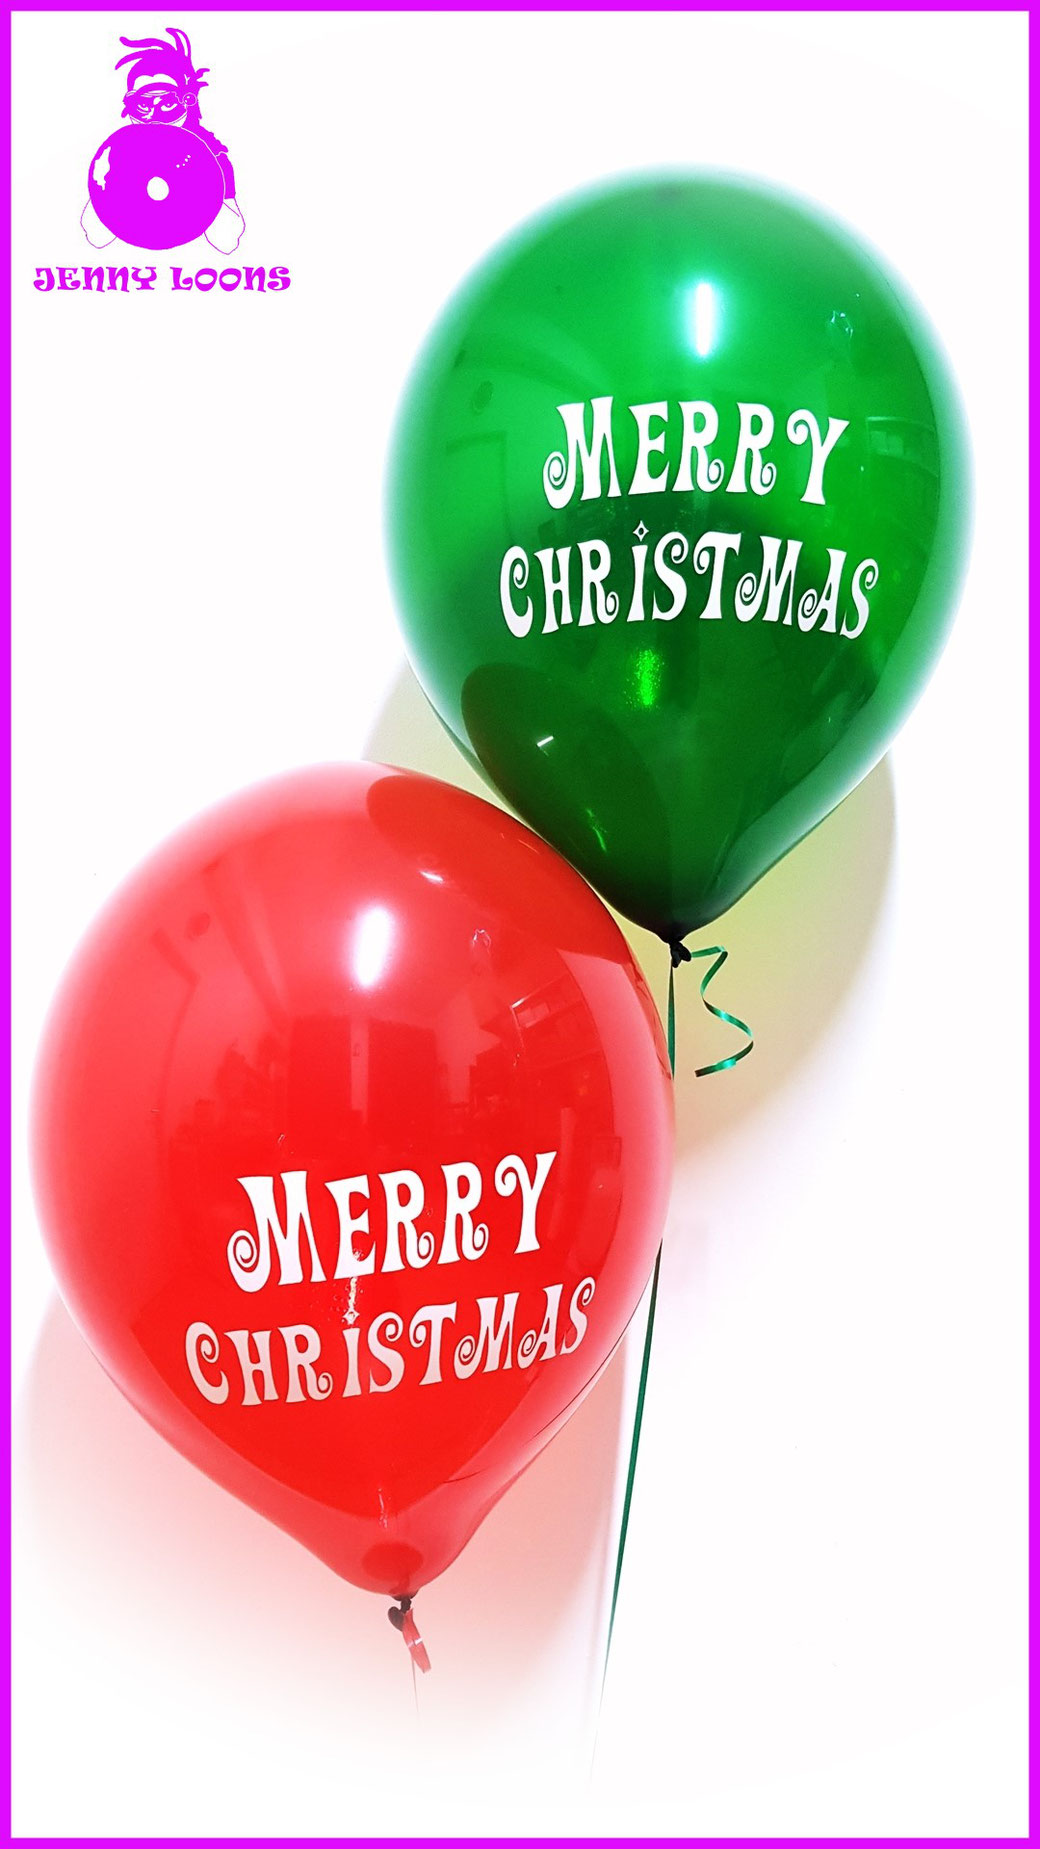 TUF-TEX TUFTEX 17inch Merry Christmas Weihnachten XMAS rot grün red green Weihnachtsmann Santa Clause Luftballons Balloons